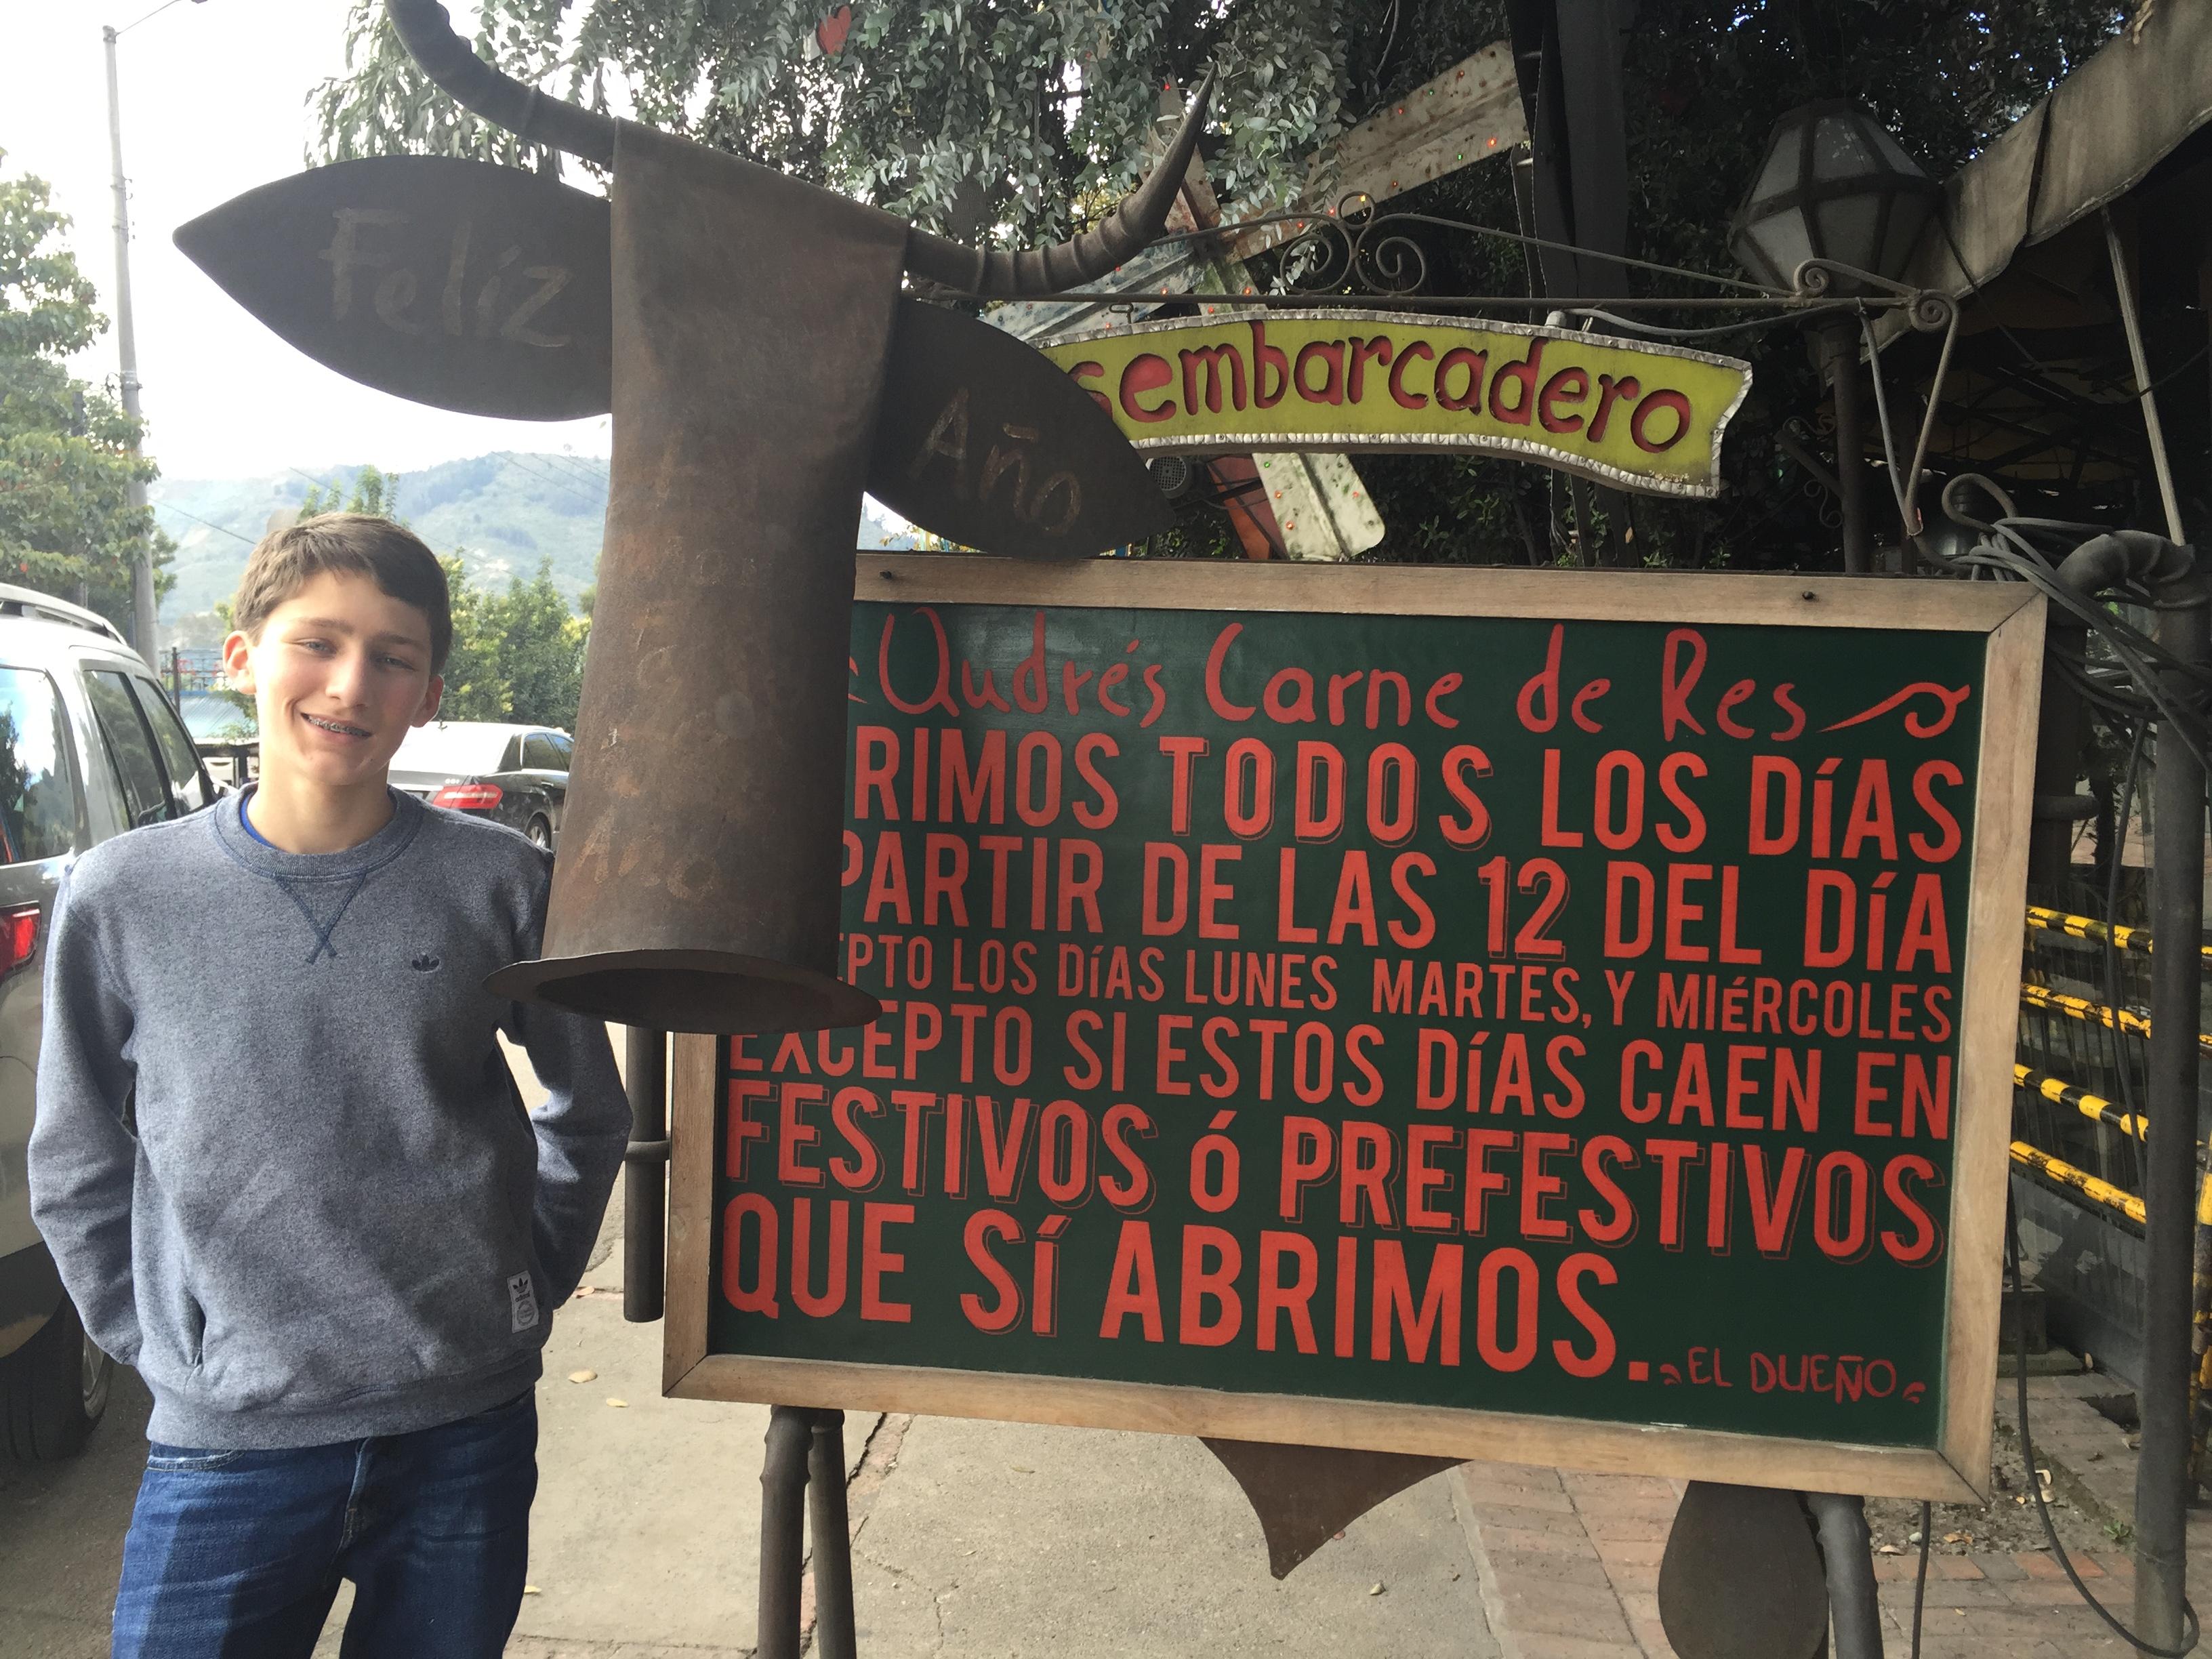 Andres Carne de Res